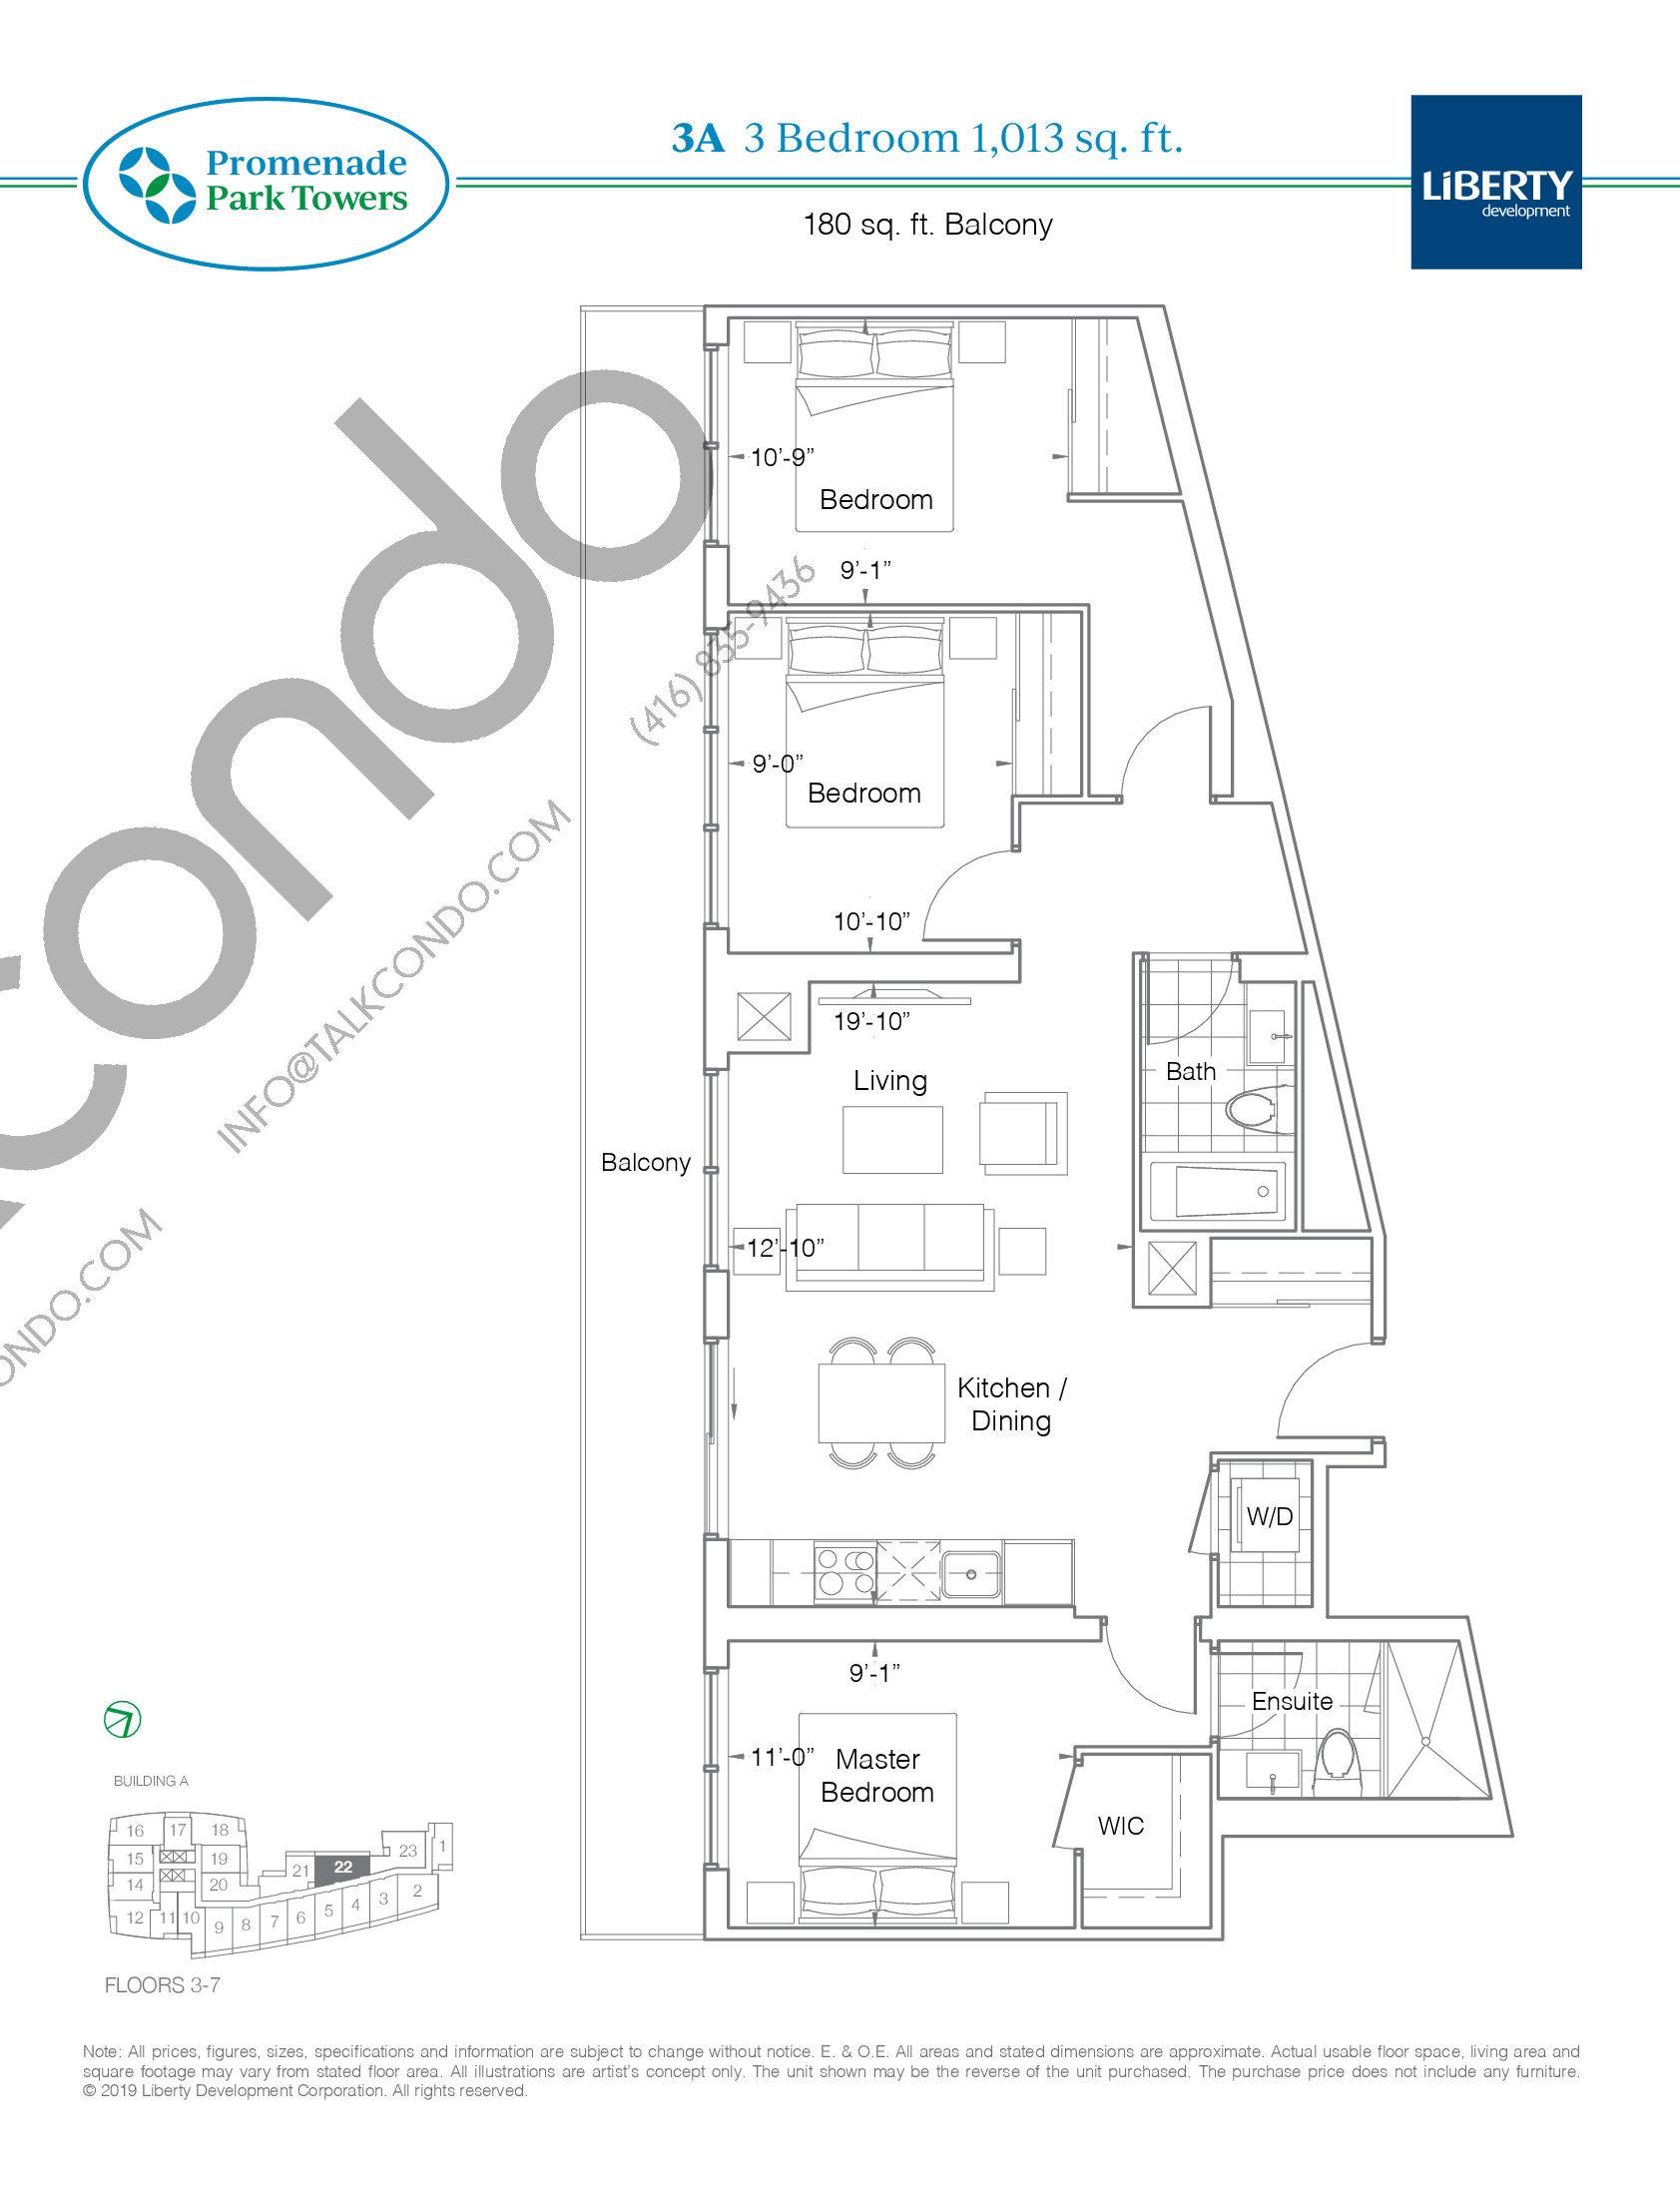 3A Floor Plan at Promenade Park Towers Condos - 1013 sq.ft